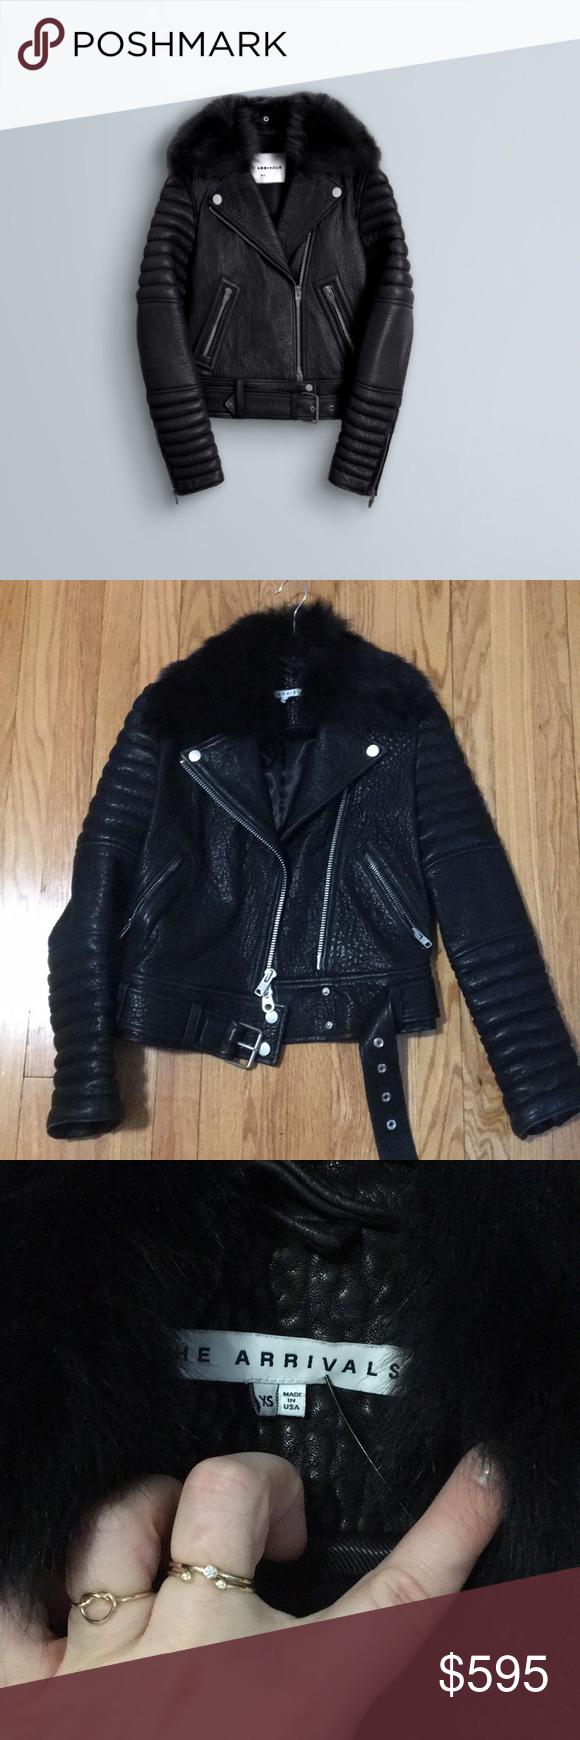 The Arrivals Rainier Black Pebbled Leather Jacket Leather Jacket Jackets Clothes Design [ 1740 x 580 Pixel ]